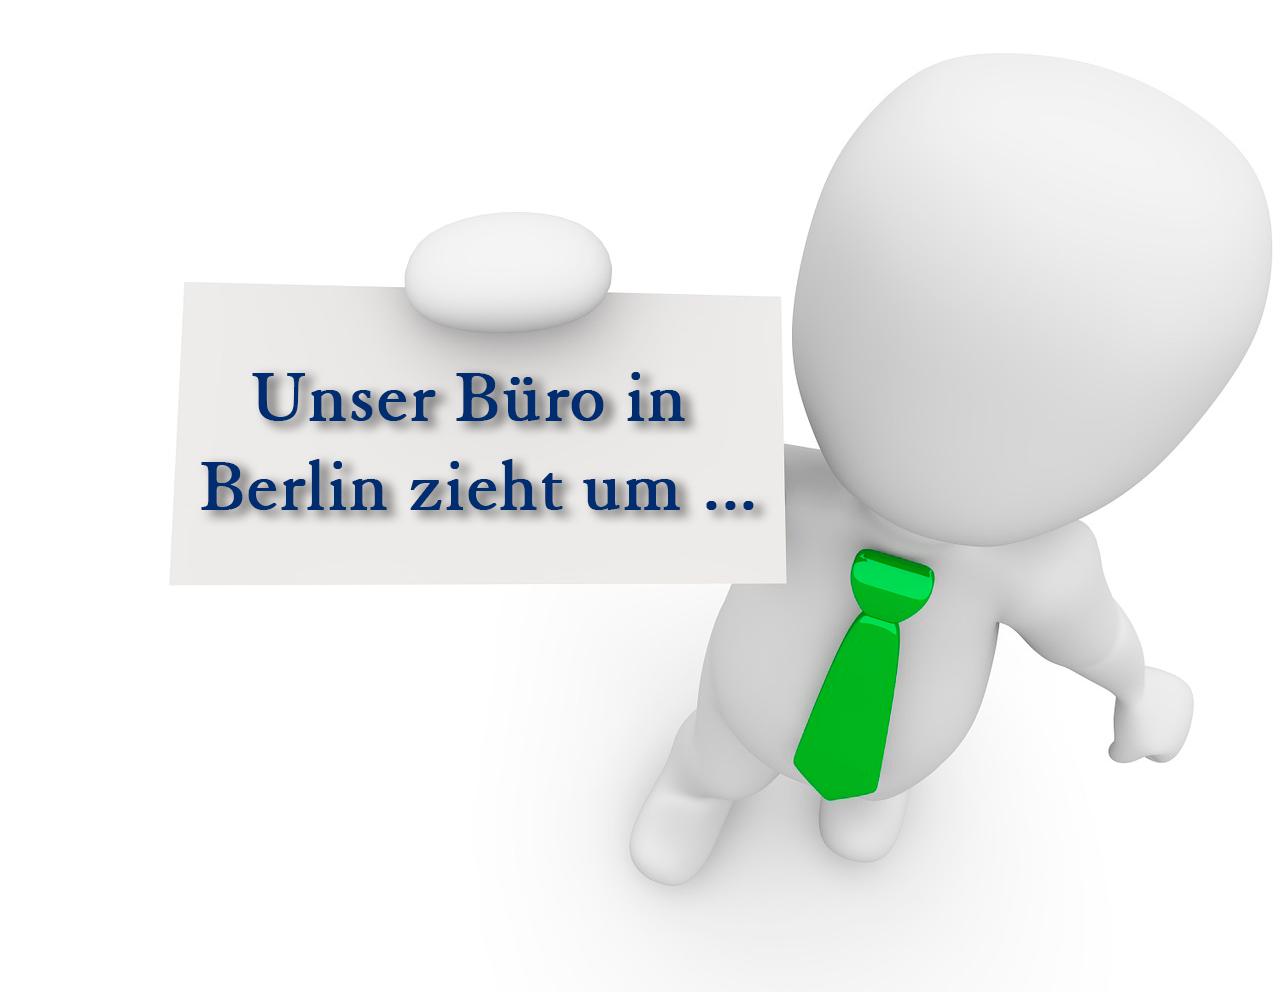 Umzug des Berliner Büros u2022 STEUERnordost | Steuerberater | Steuerberatung - PNG Umzug Buro